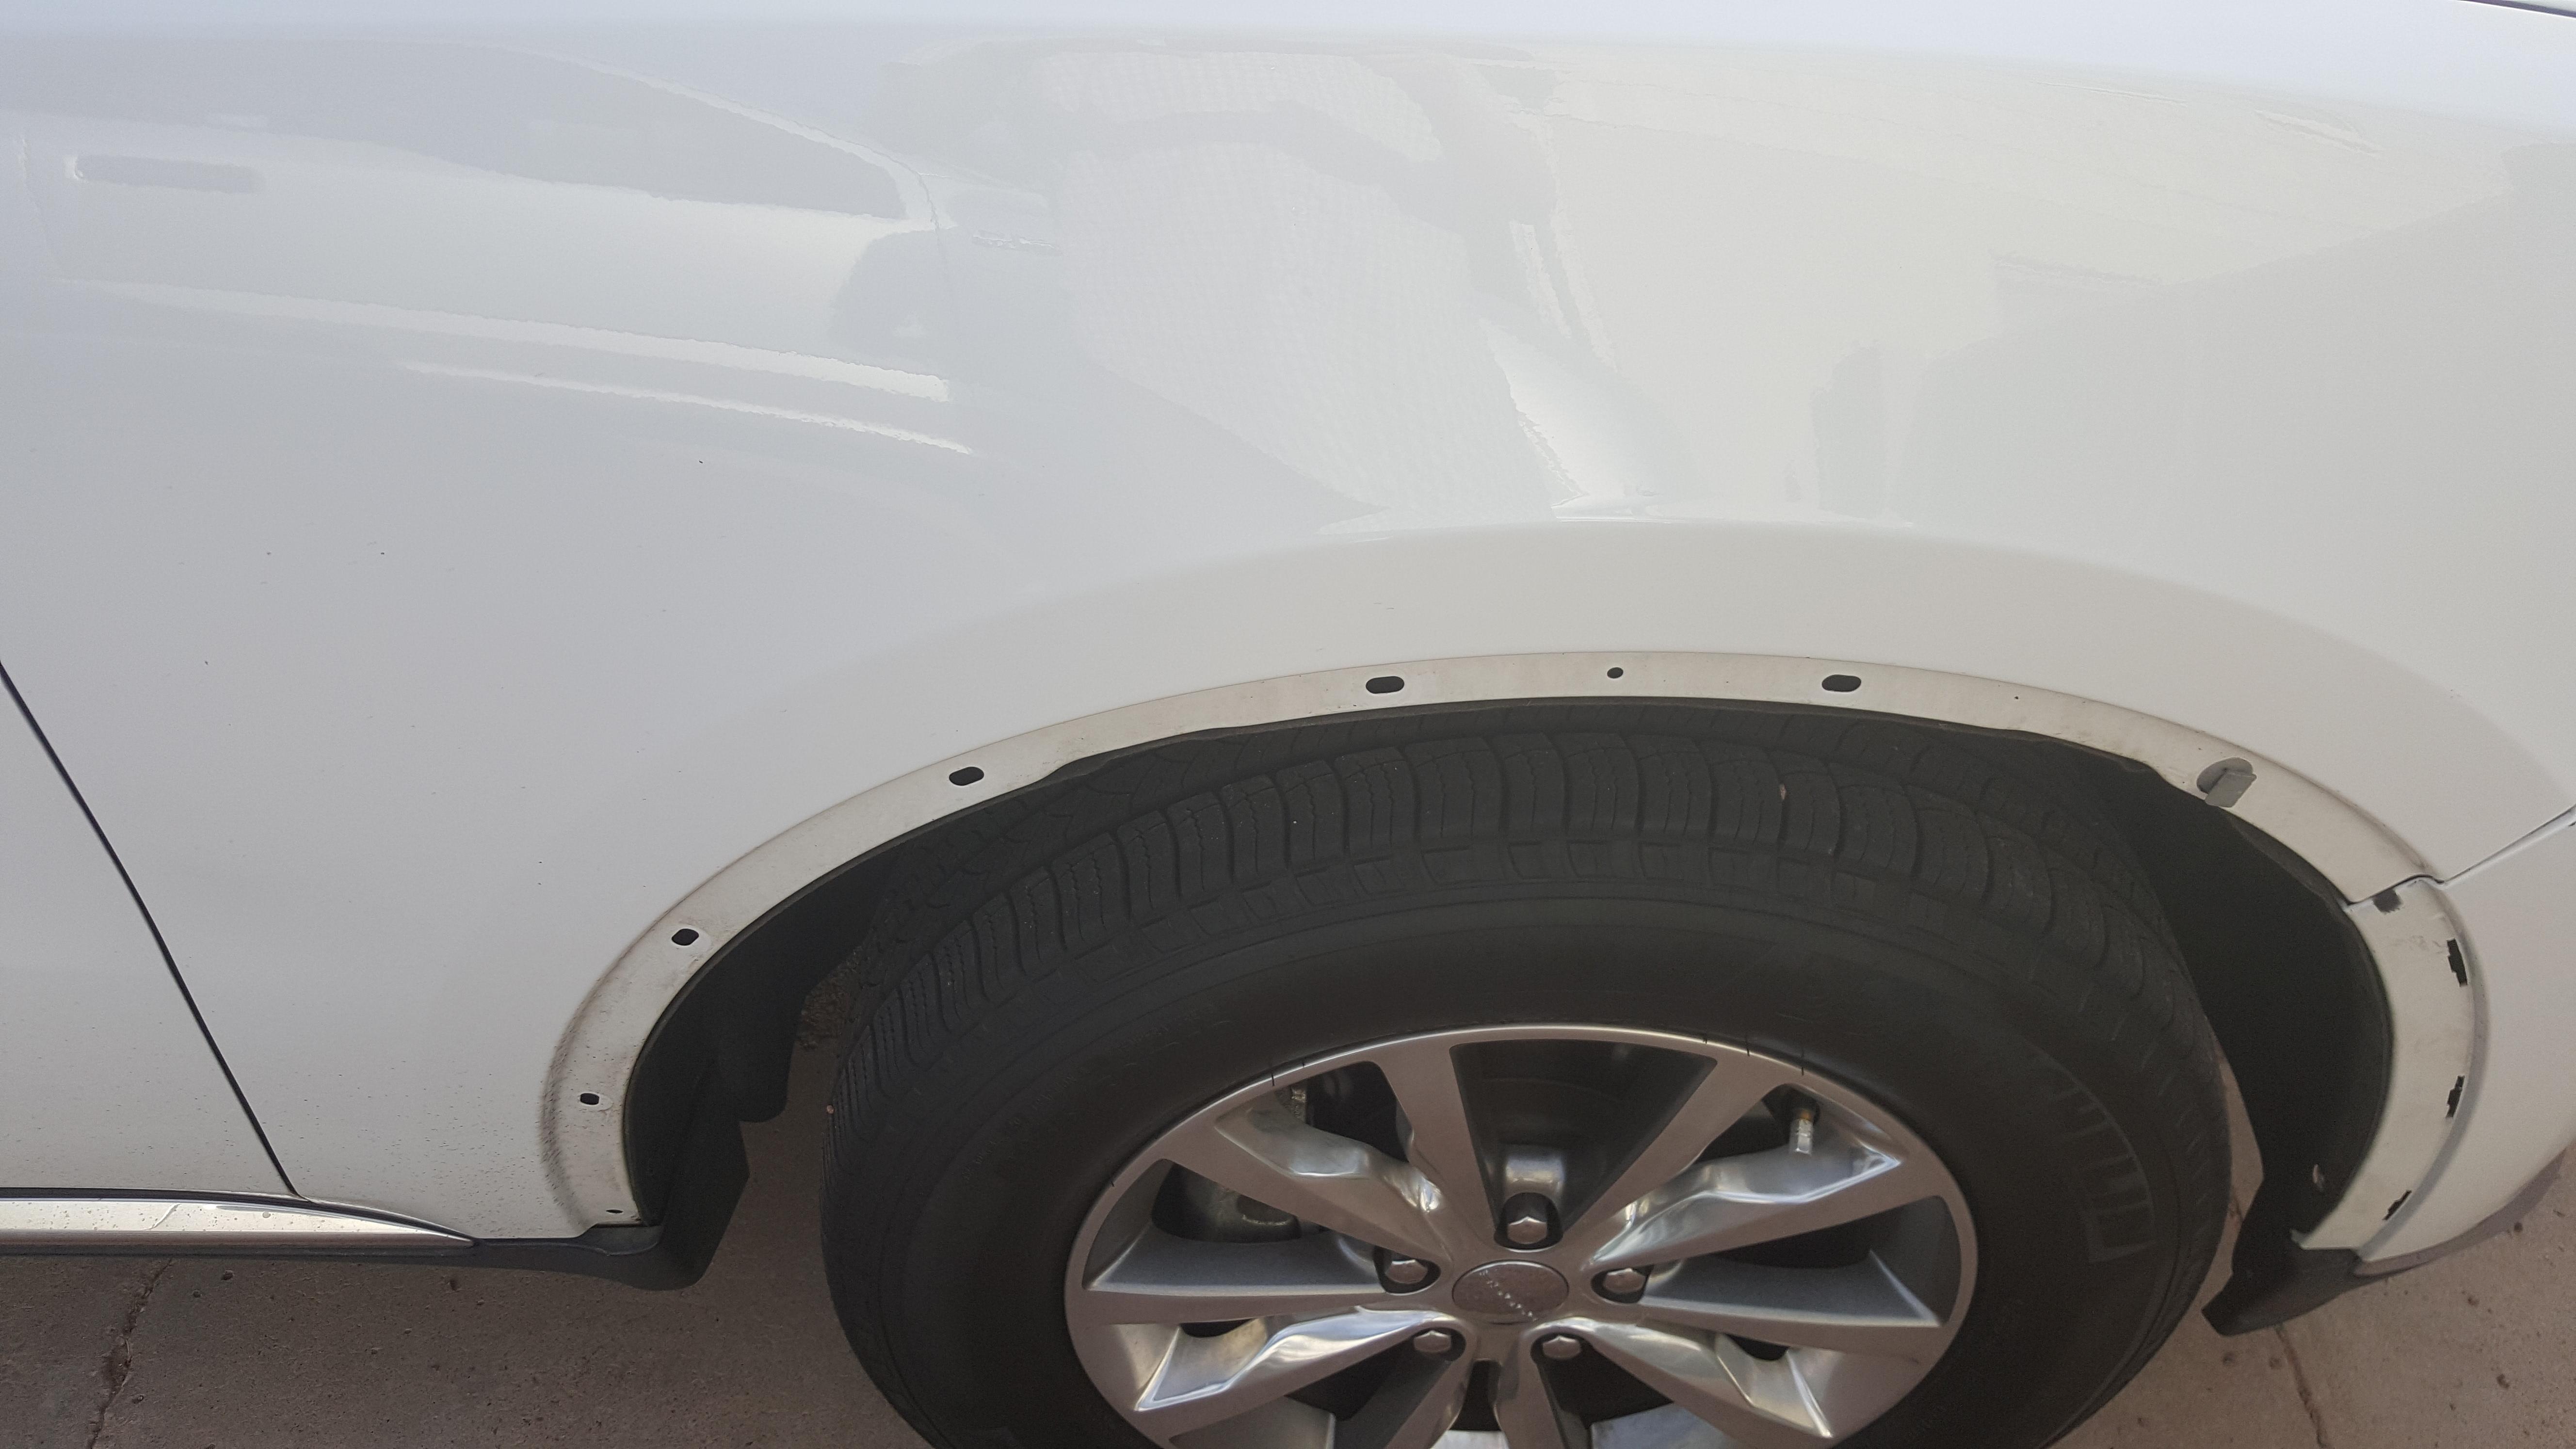 Clean Freak Car Wash 711 Grand Ave, Phoenix, AZ 85007 - YP.com